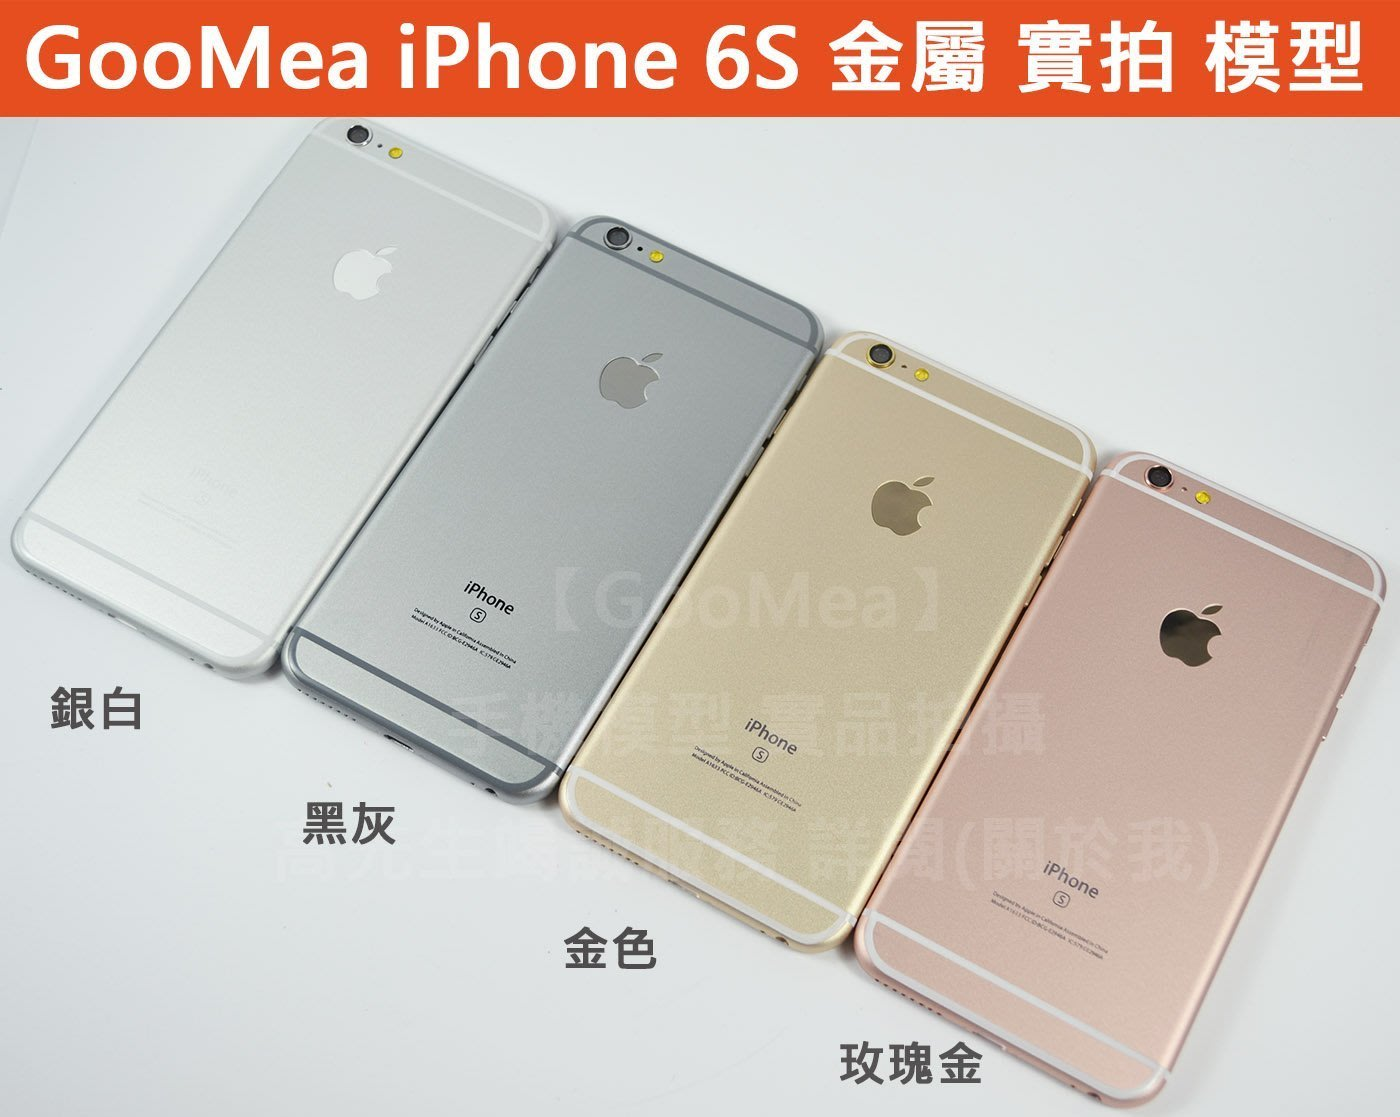 GooMea 金屬版 Apple 蘋果 iPhone 6 6S 展示機模型Dummy樣品包膜假機道具上繳上交展示拍戲摔機